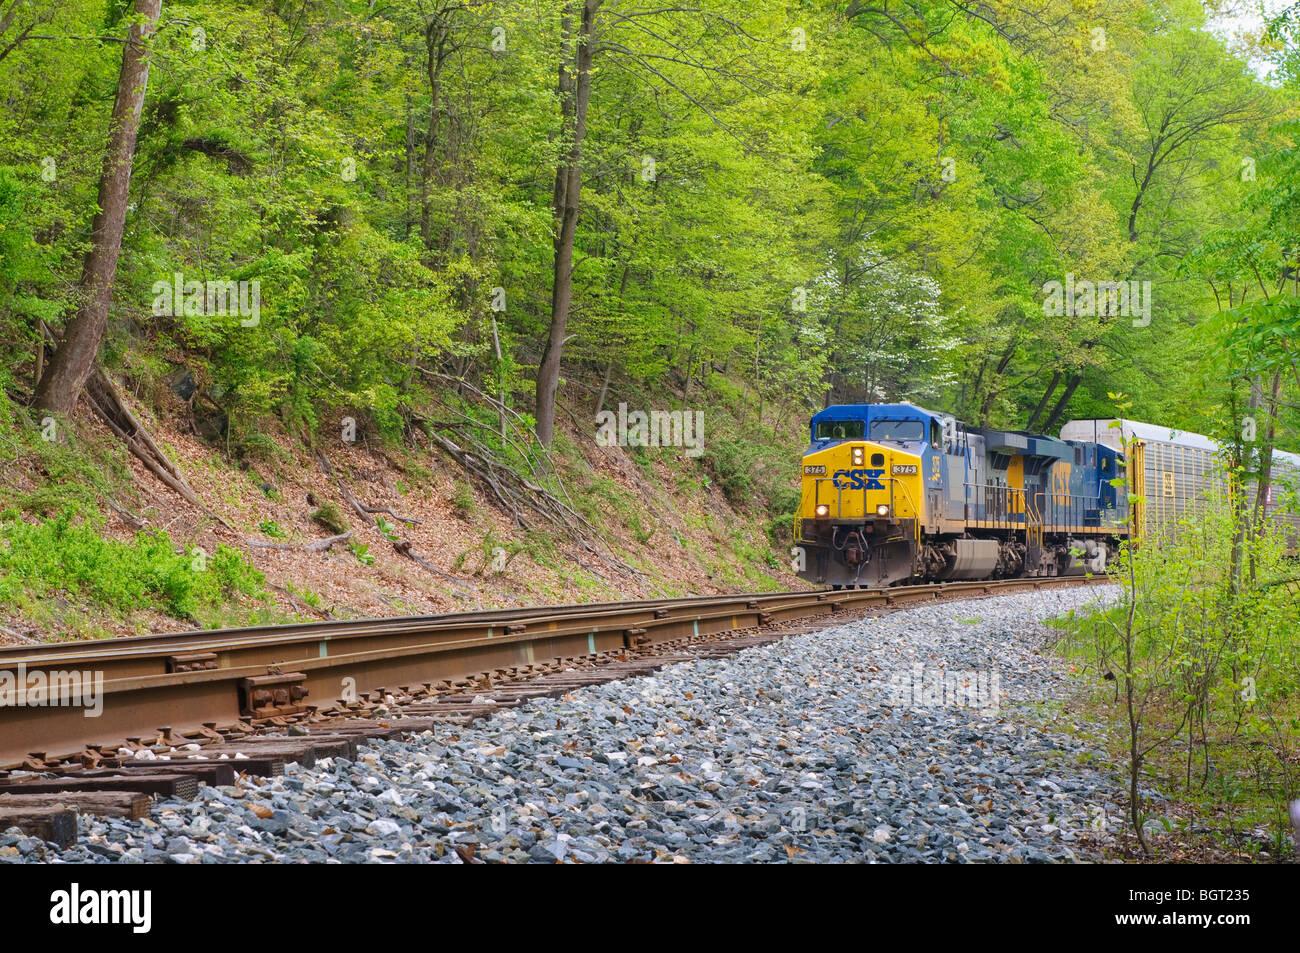 Csx Train Stock Photos & Csx Train Stock Images - Alamy